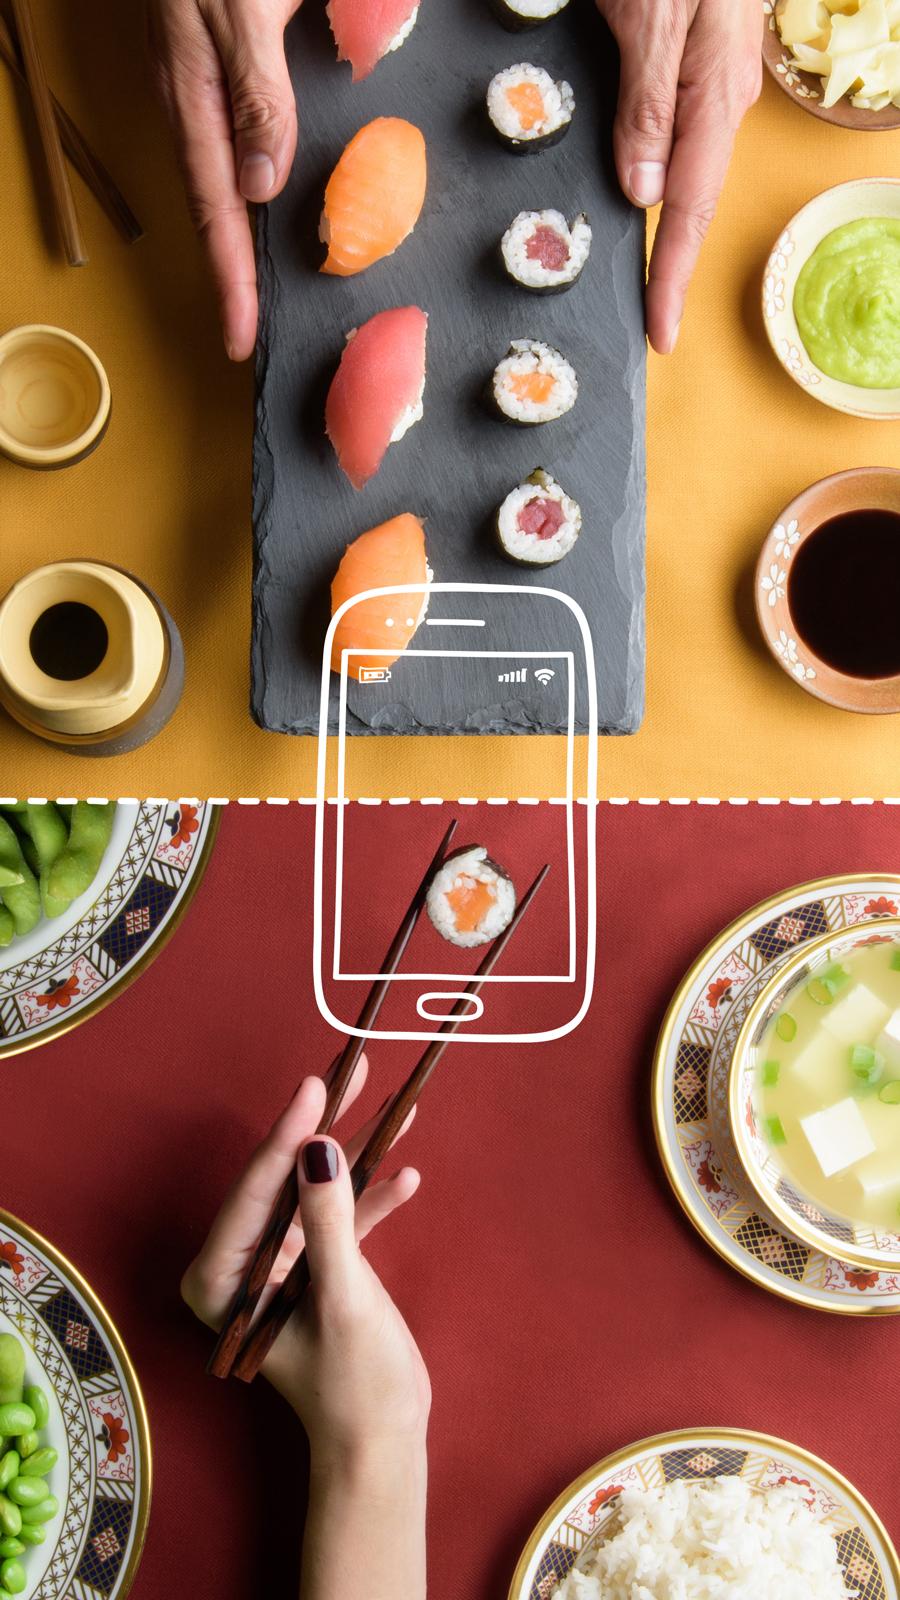 Meal-Sharing.jpg